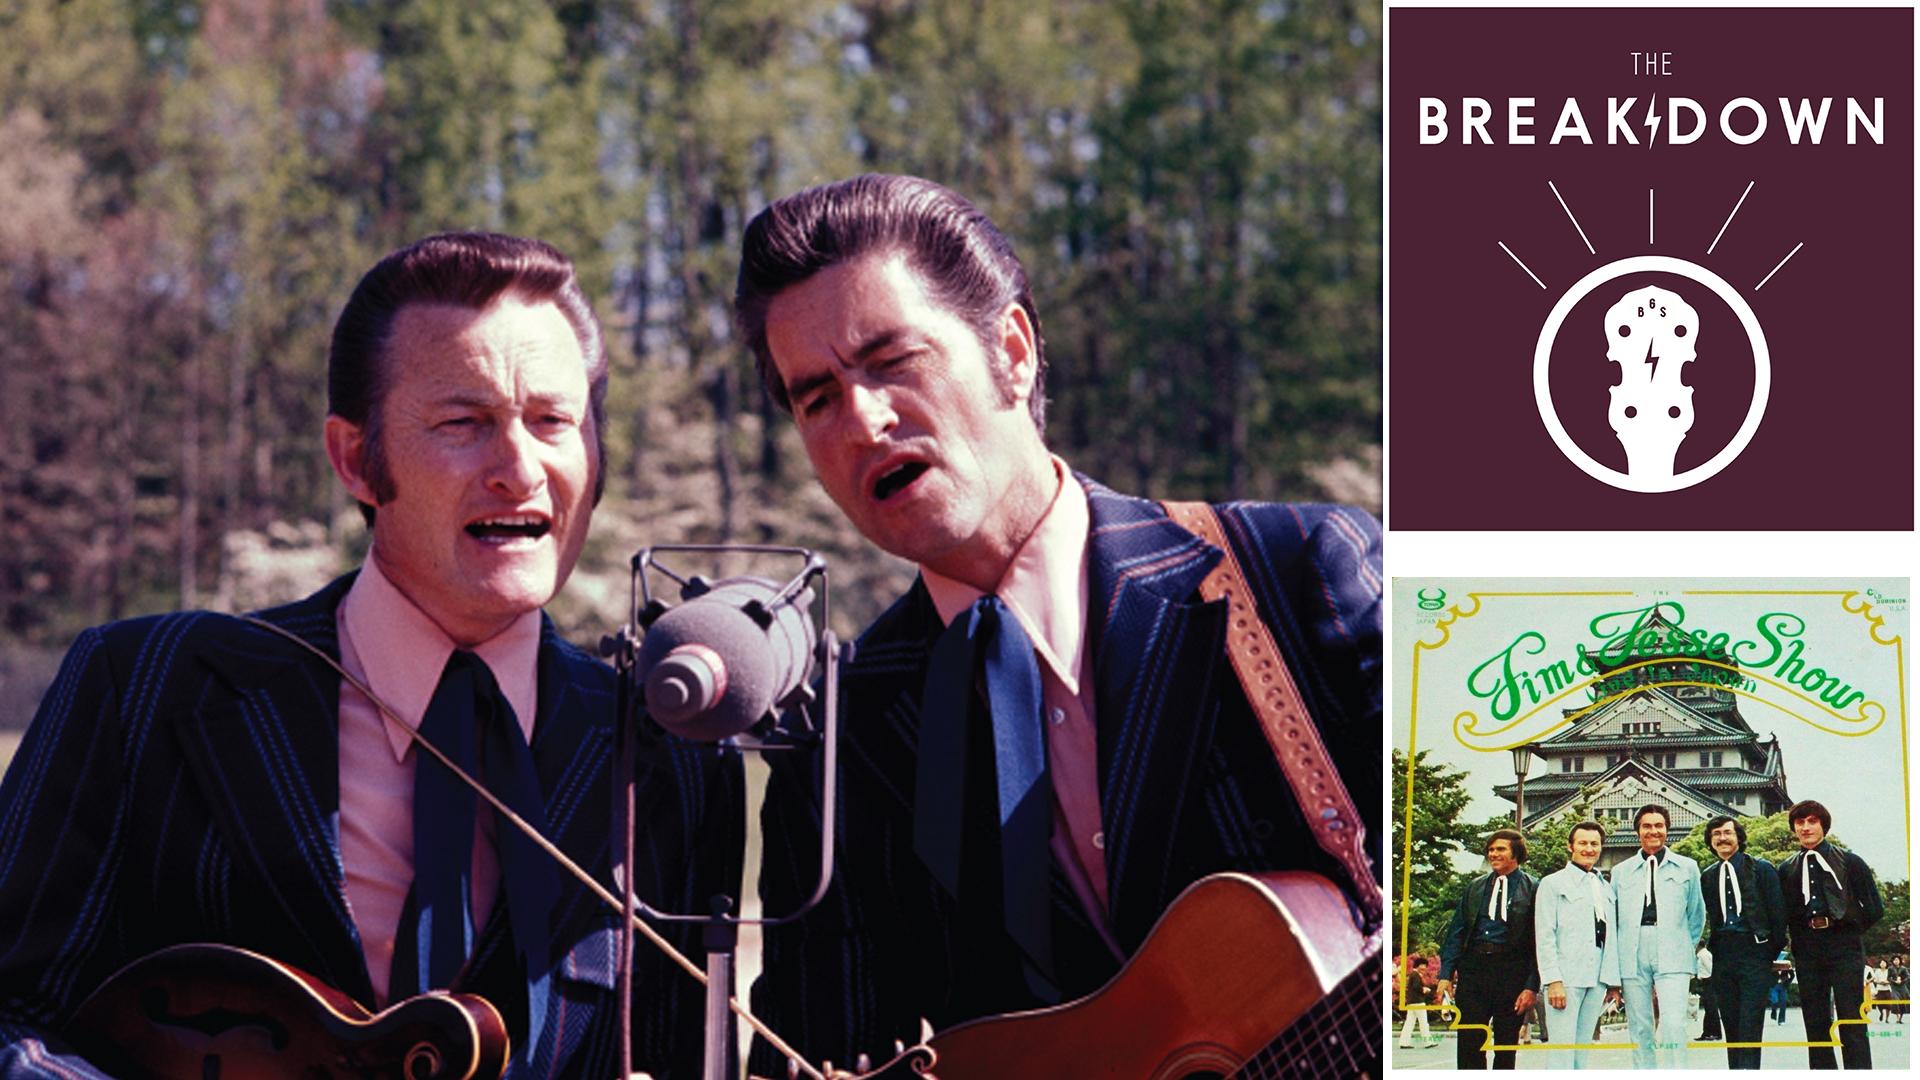 The Breakdown – Jim & Jesse, 'The Jim & Jesse Show'